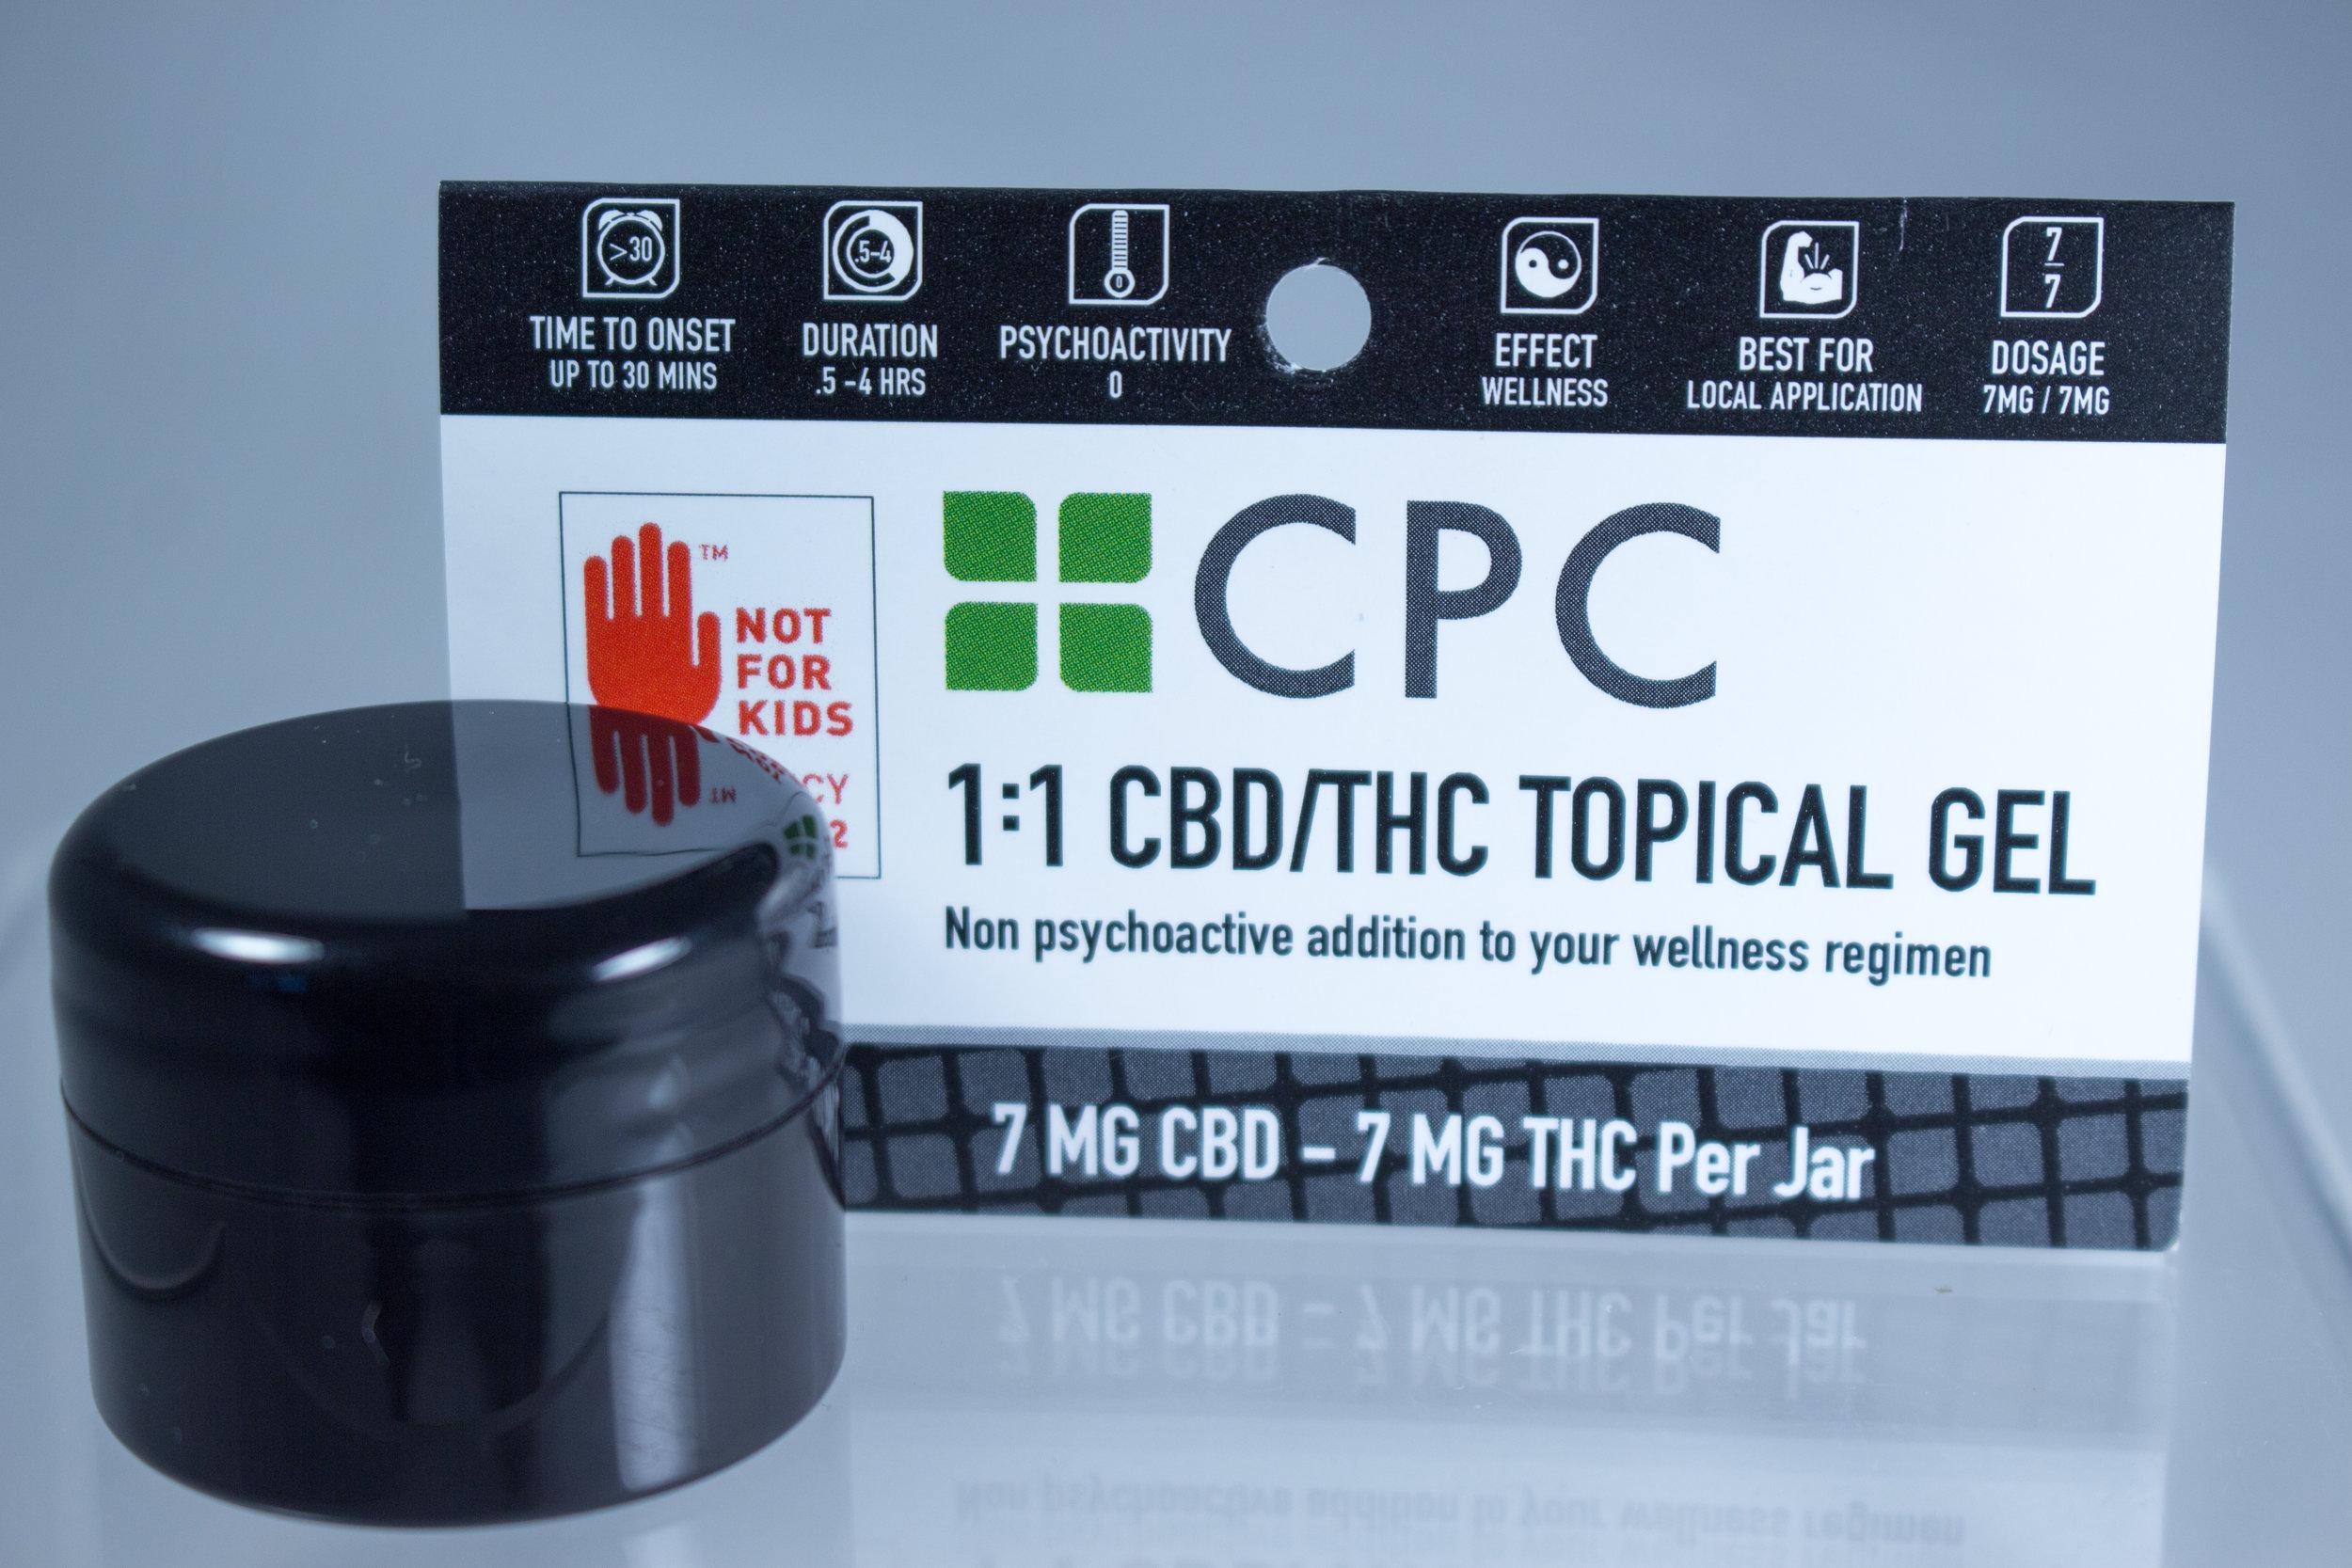 CBD and THC cannabis oil topical gel